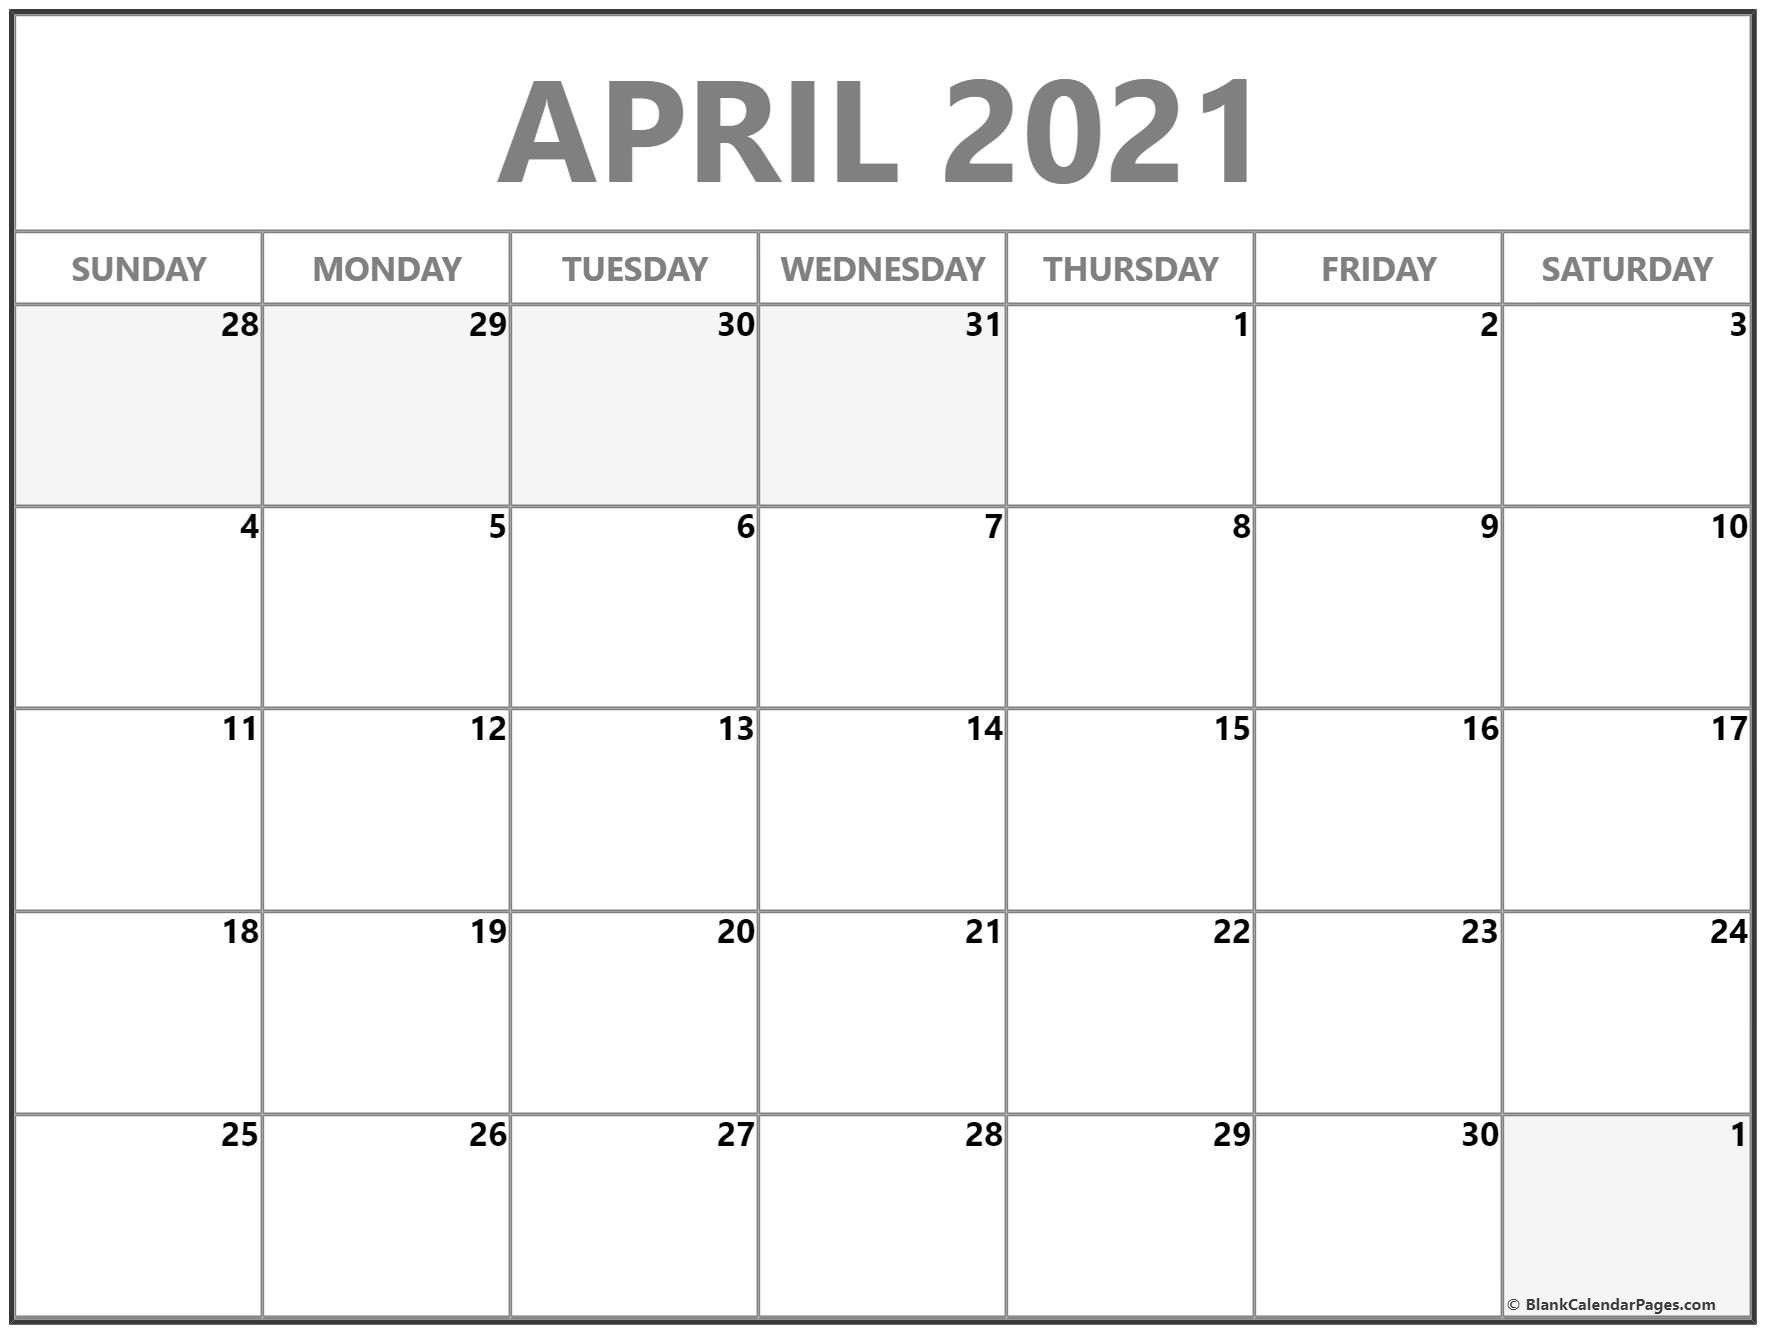 3 Month Calendar February To April 2021 In 2021 | Calendar